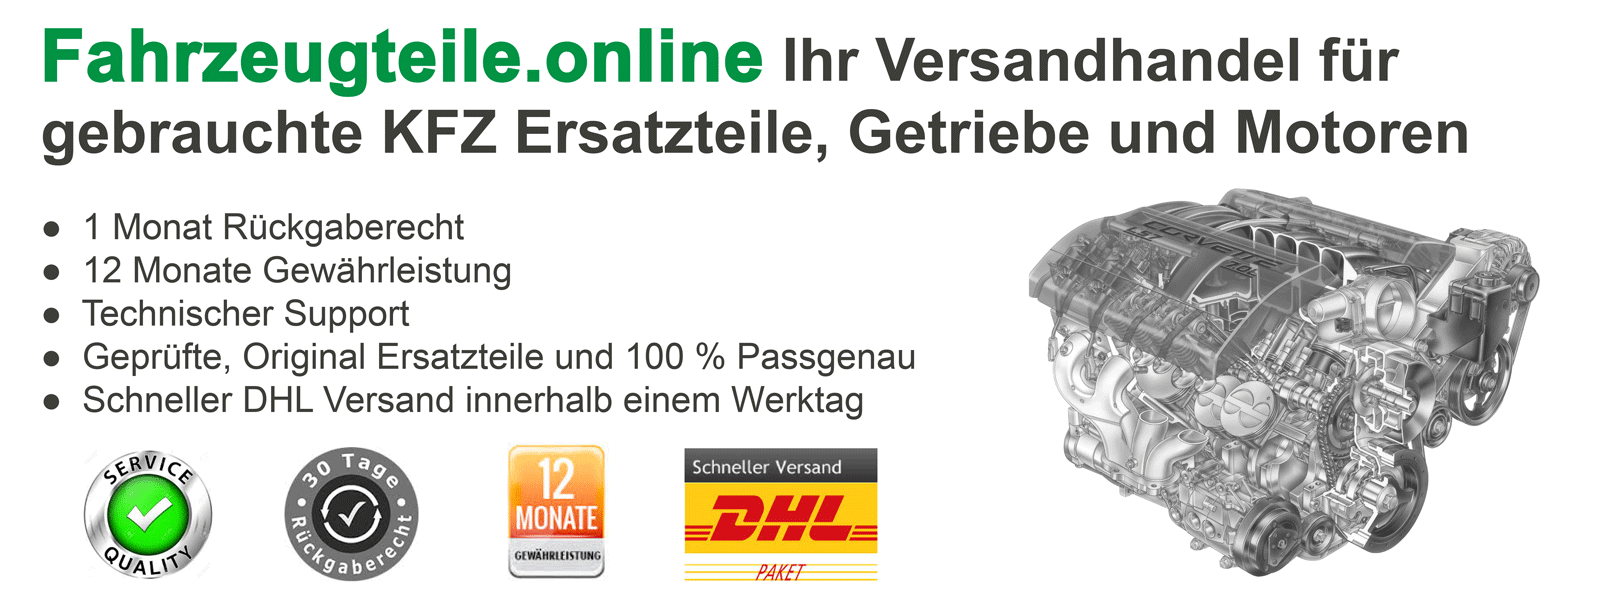 Fahrzeugteile Online Banner #2